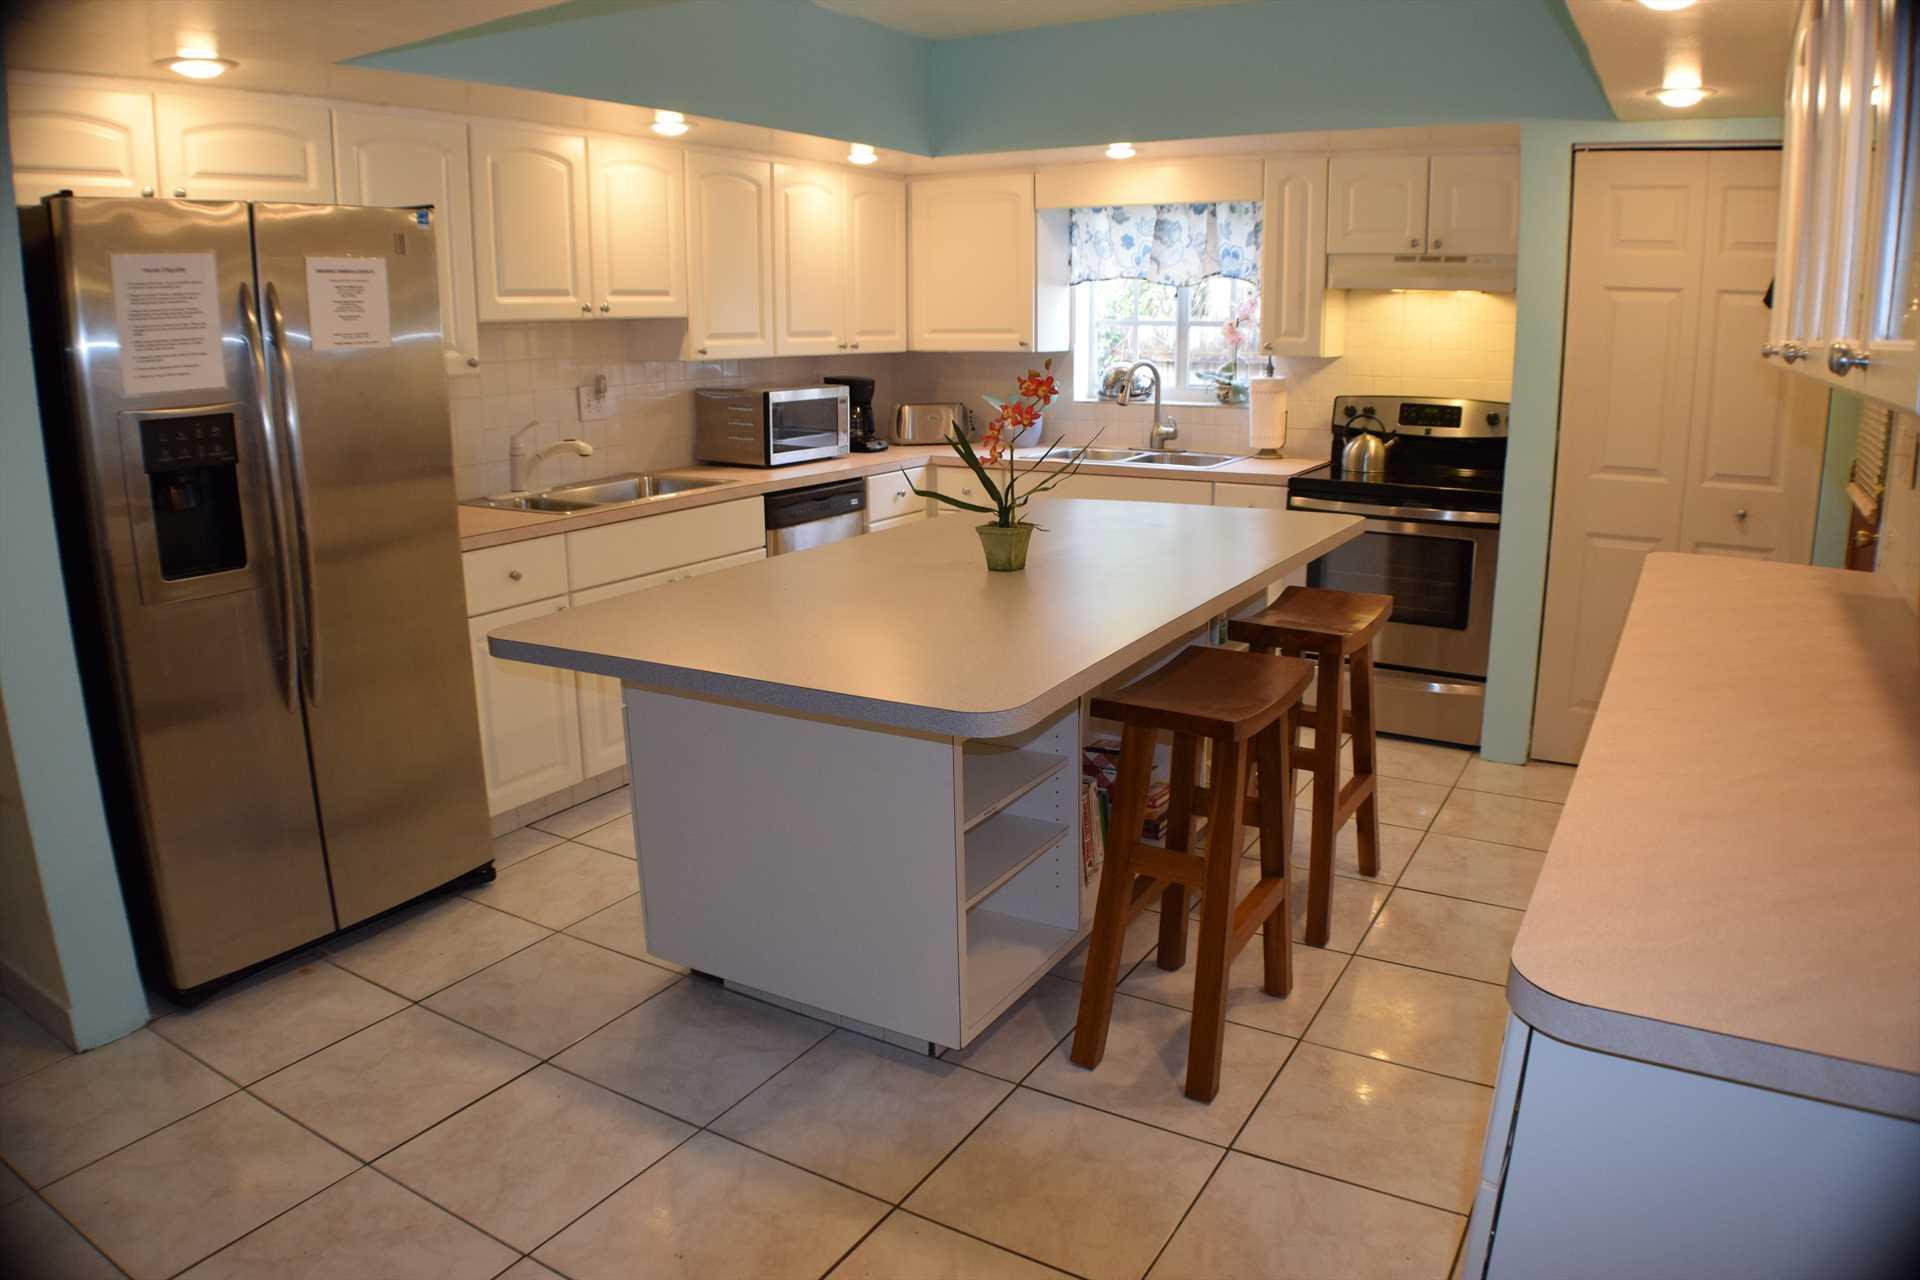 100 kitchen cabinets pompano beach birch wood chestnut lasa